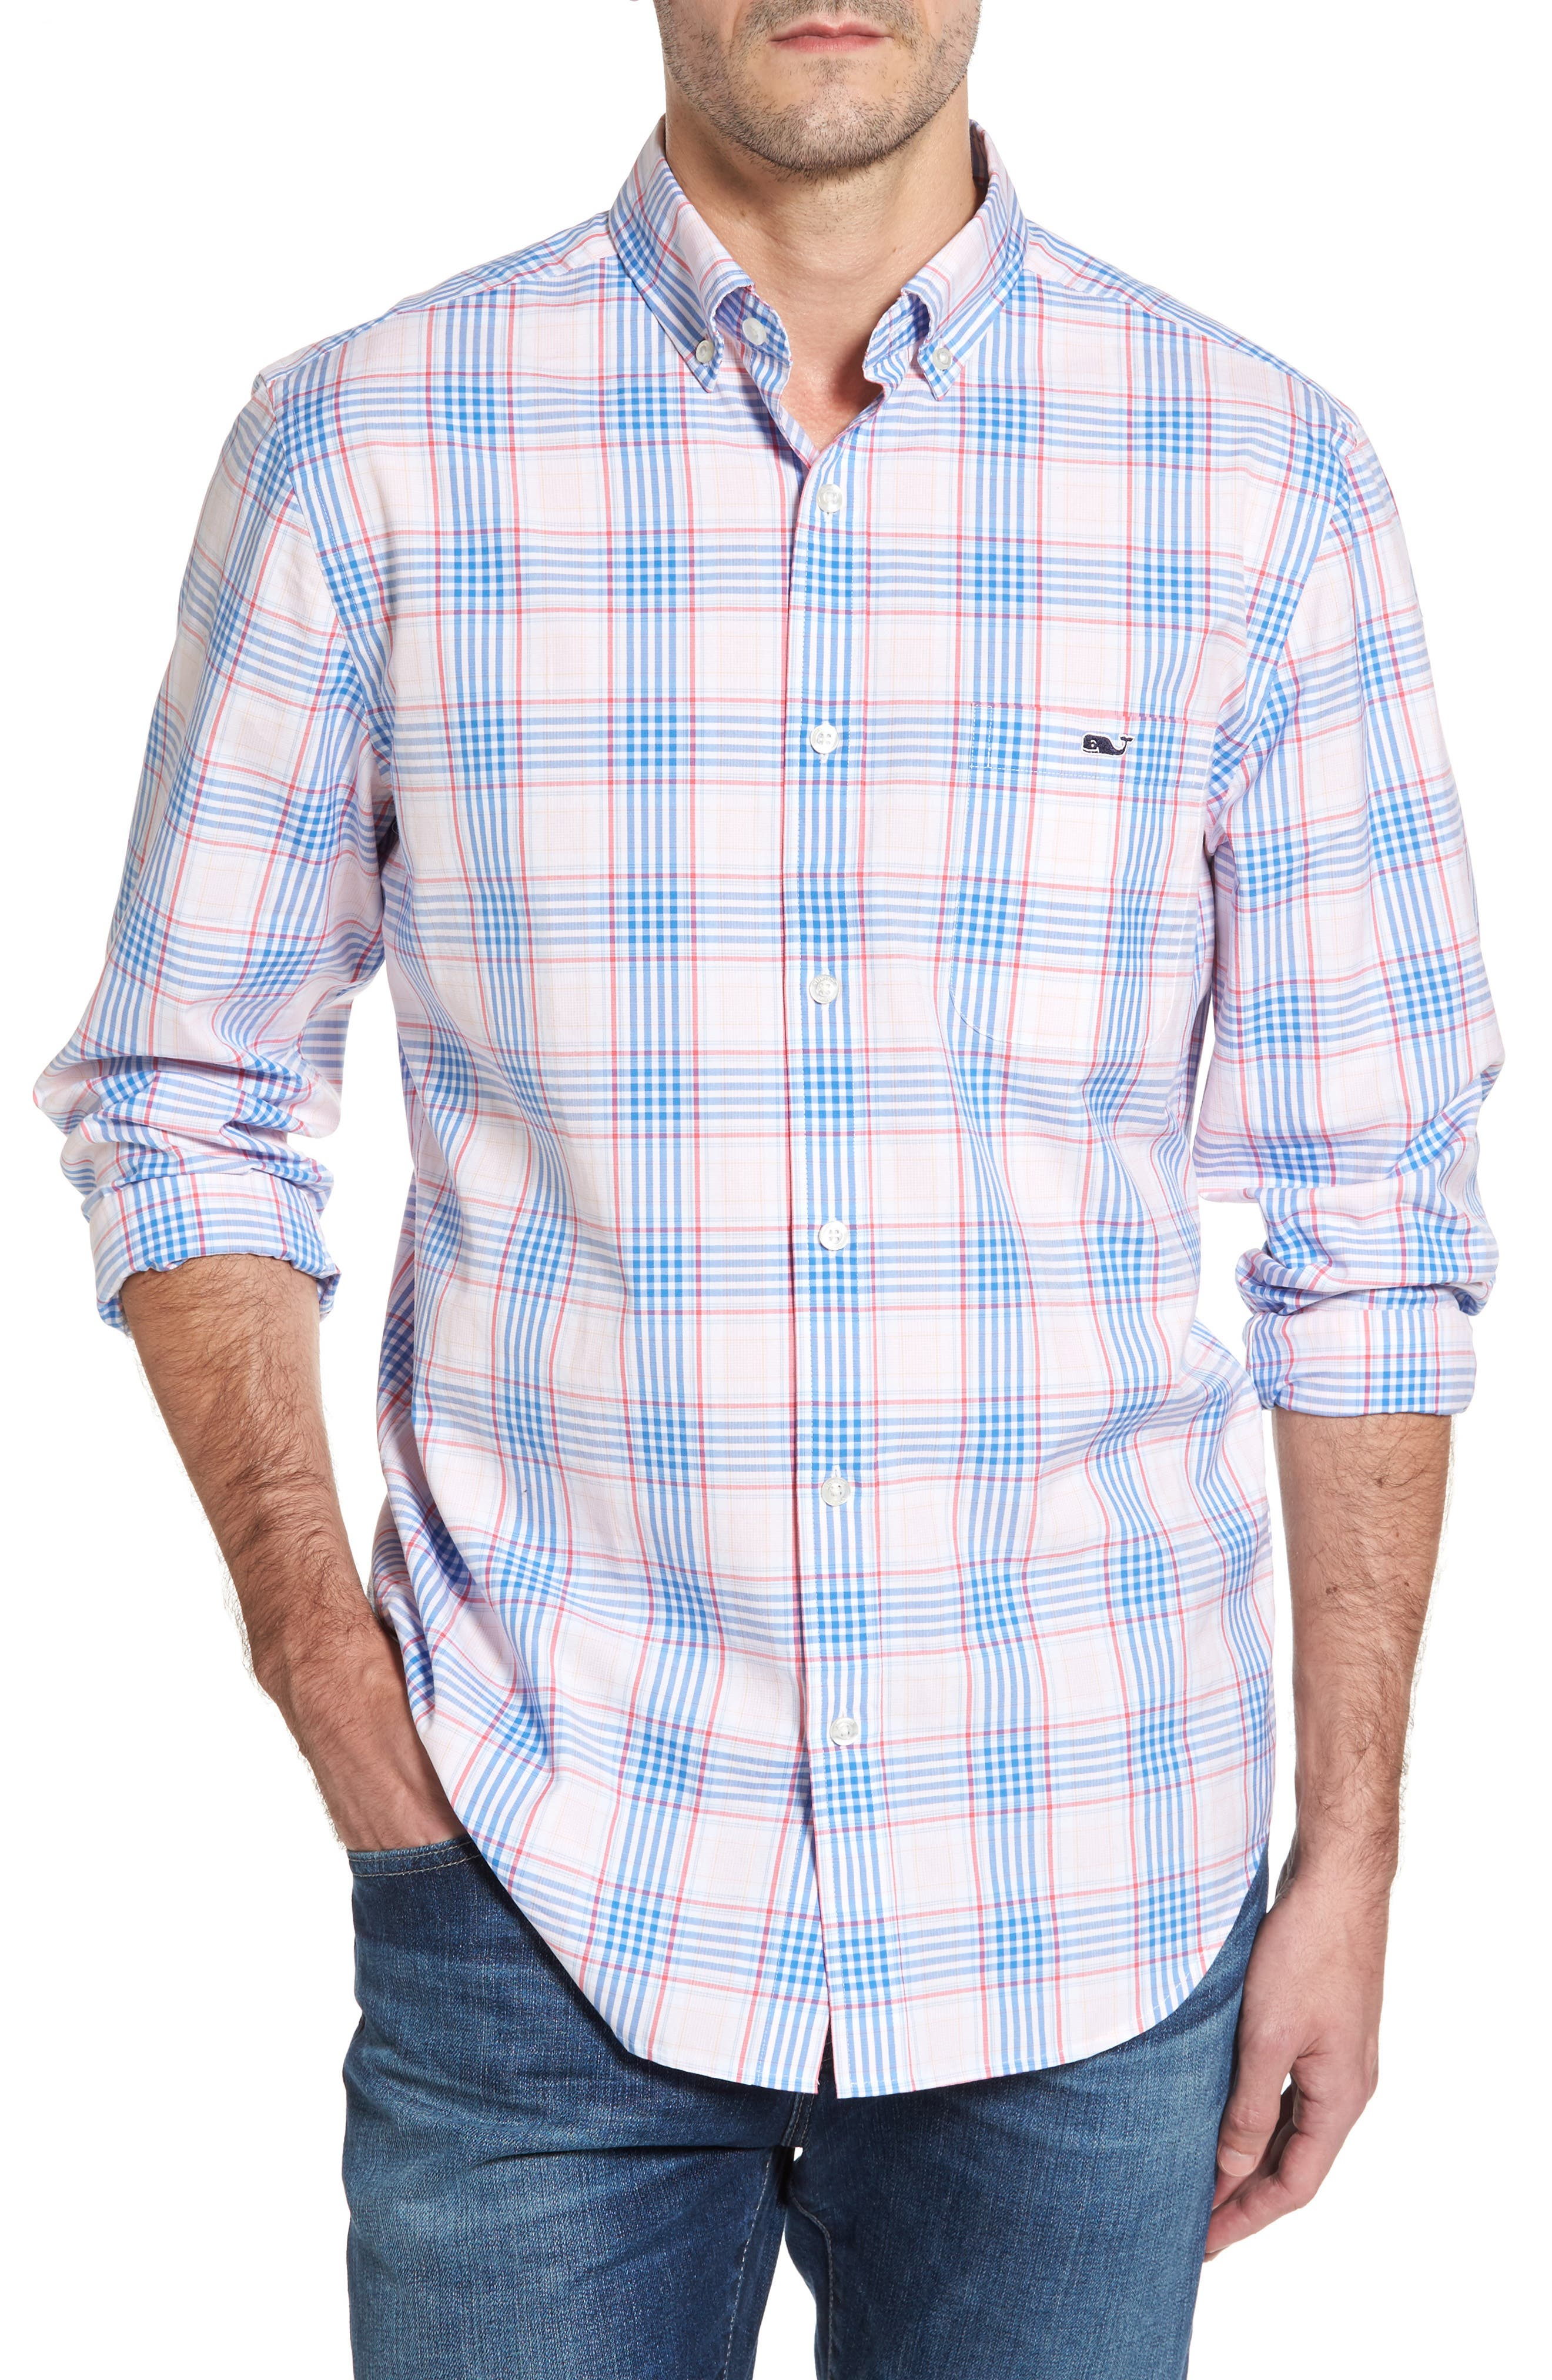 Main Image - vineyard vines Pelican Plaid Tucker Classic Fit Sport Shirt